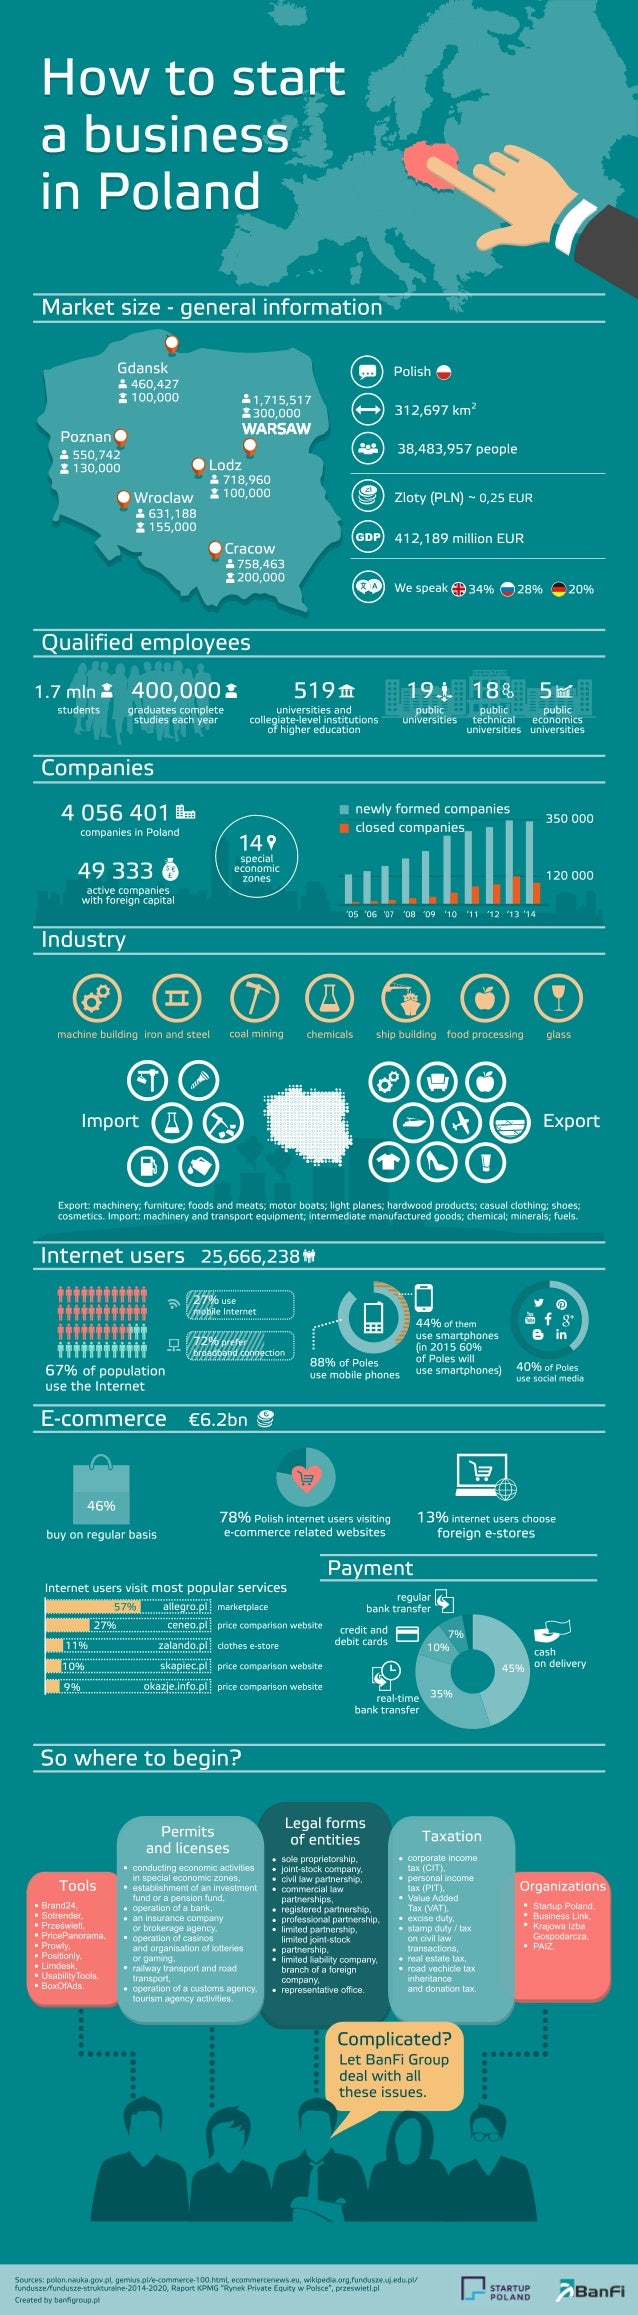 a business  in Poland       Market size - general information  0 Gdansk Polish 5: 460,427 m G 3. 100,000 : .1,715,51 7 2 3...